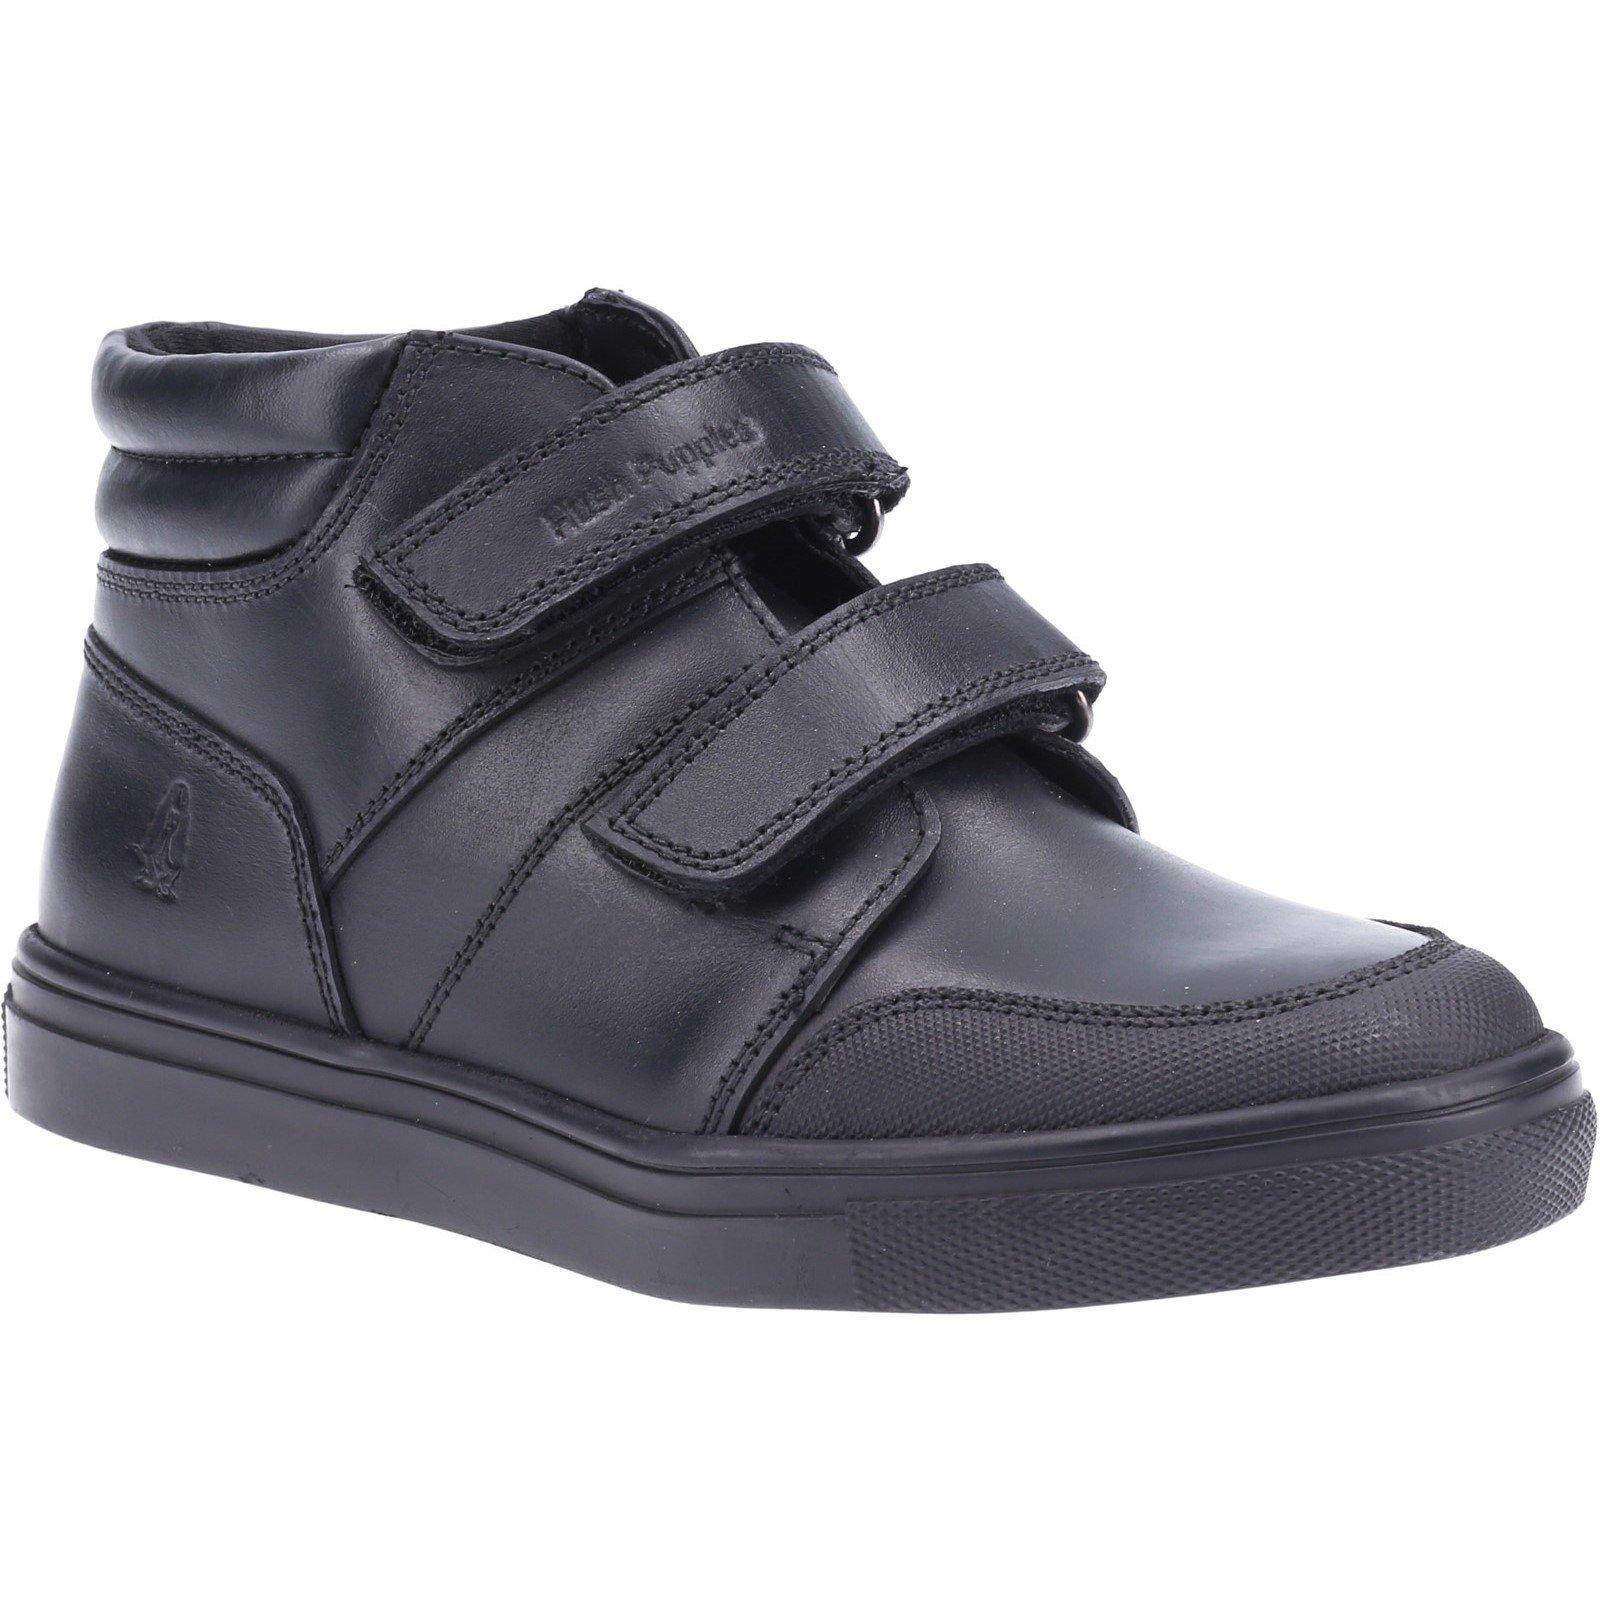 Hush Puppies Kid's Seth Senior School Boot Black 32570 - Black 5